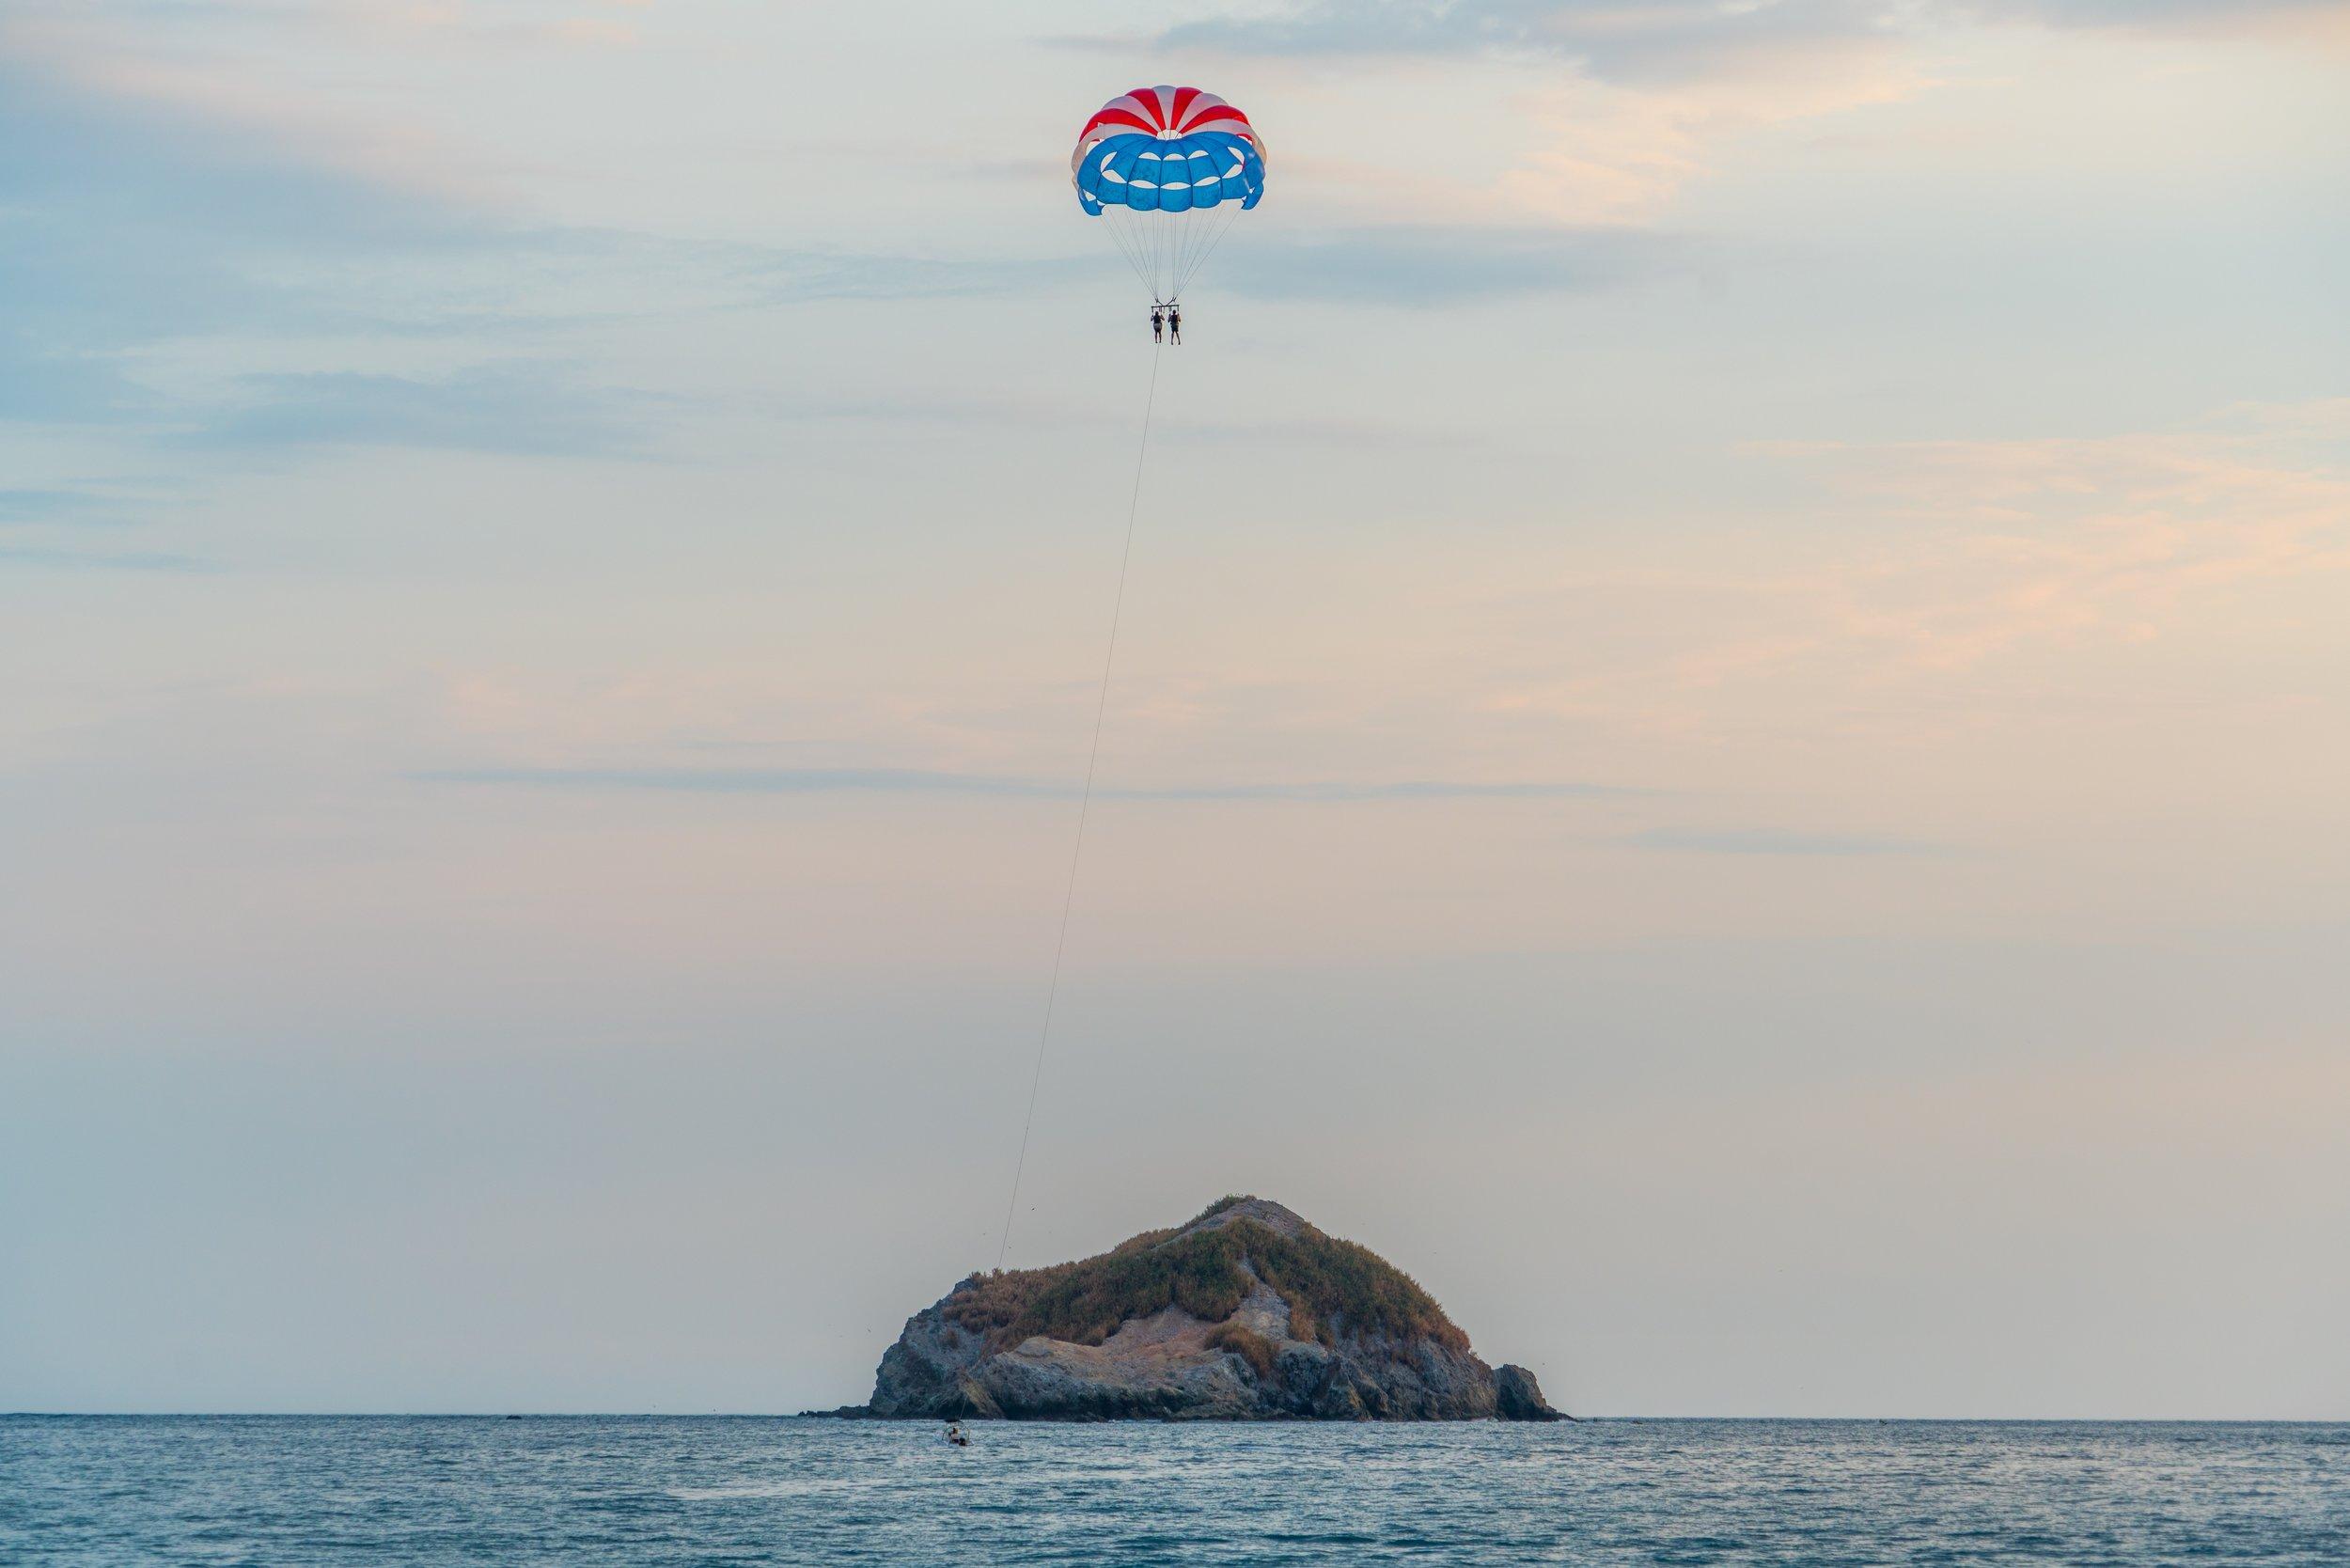 Parasailing in Costa Rica